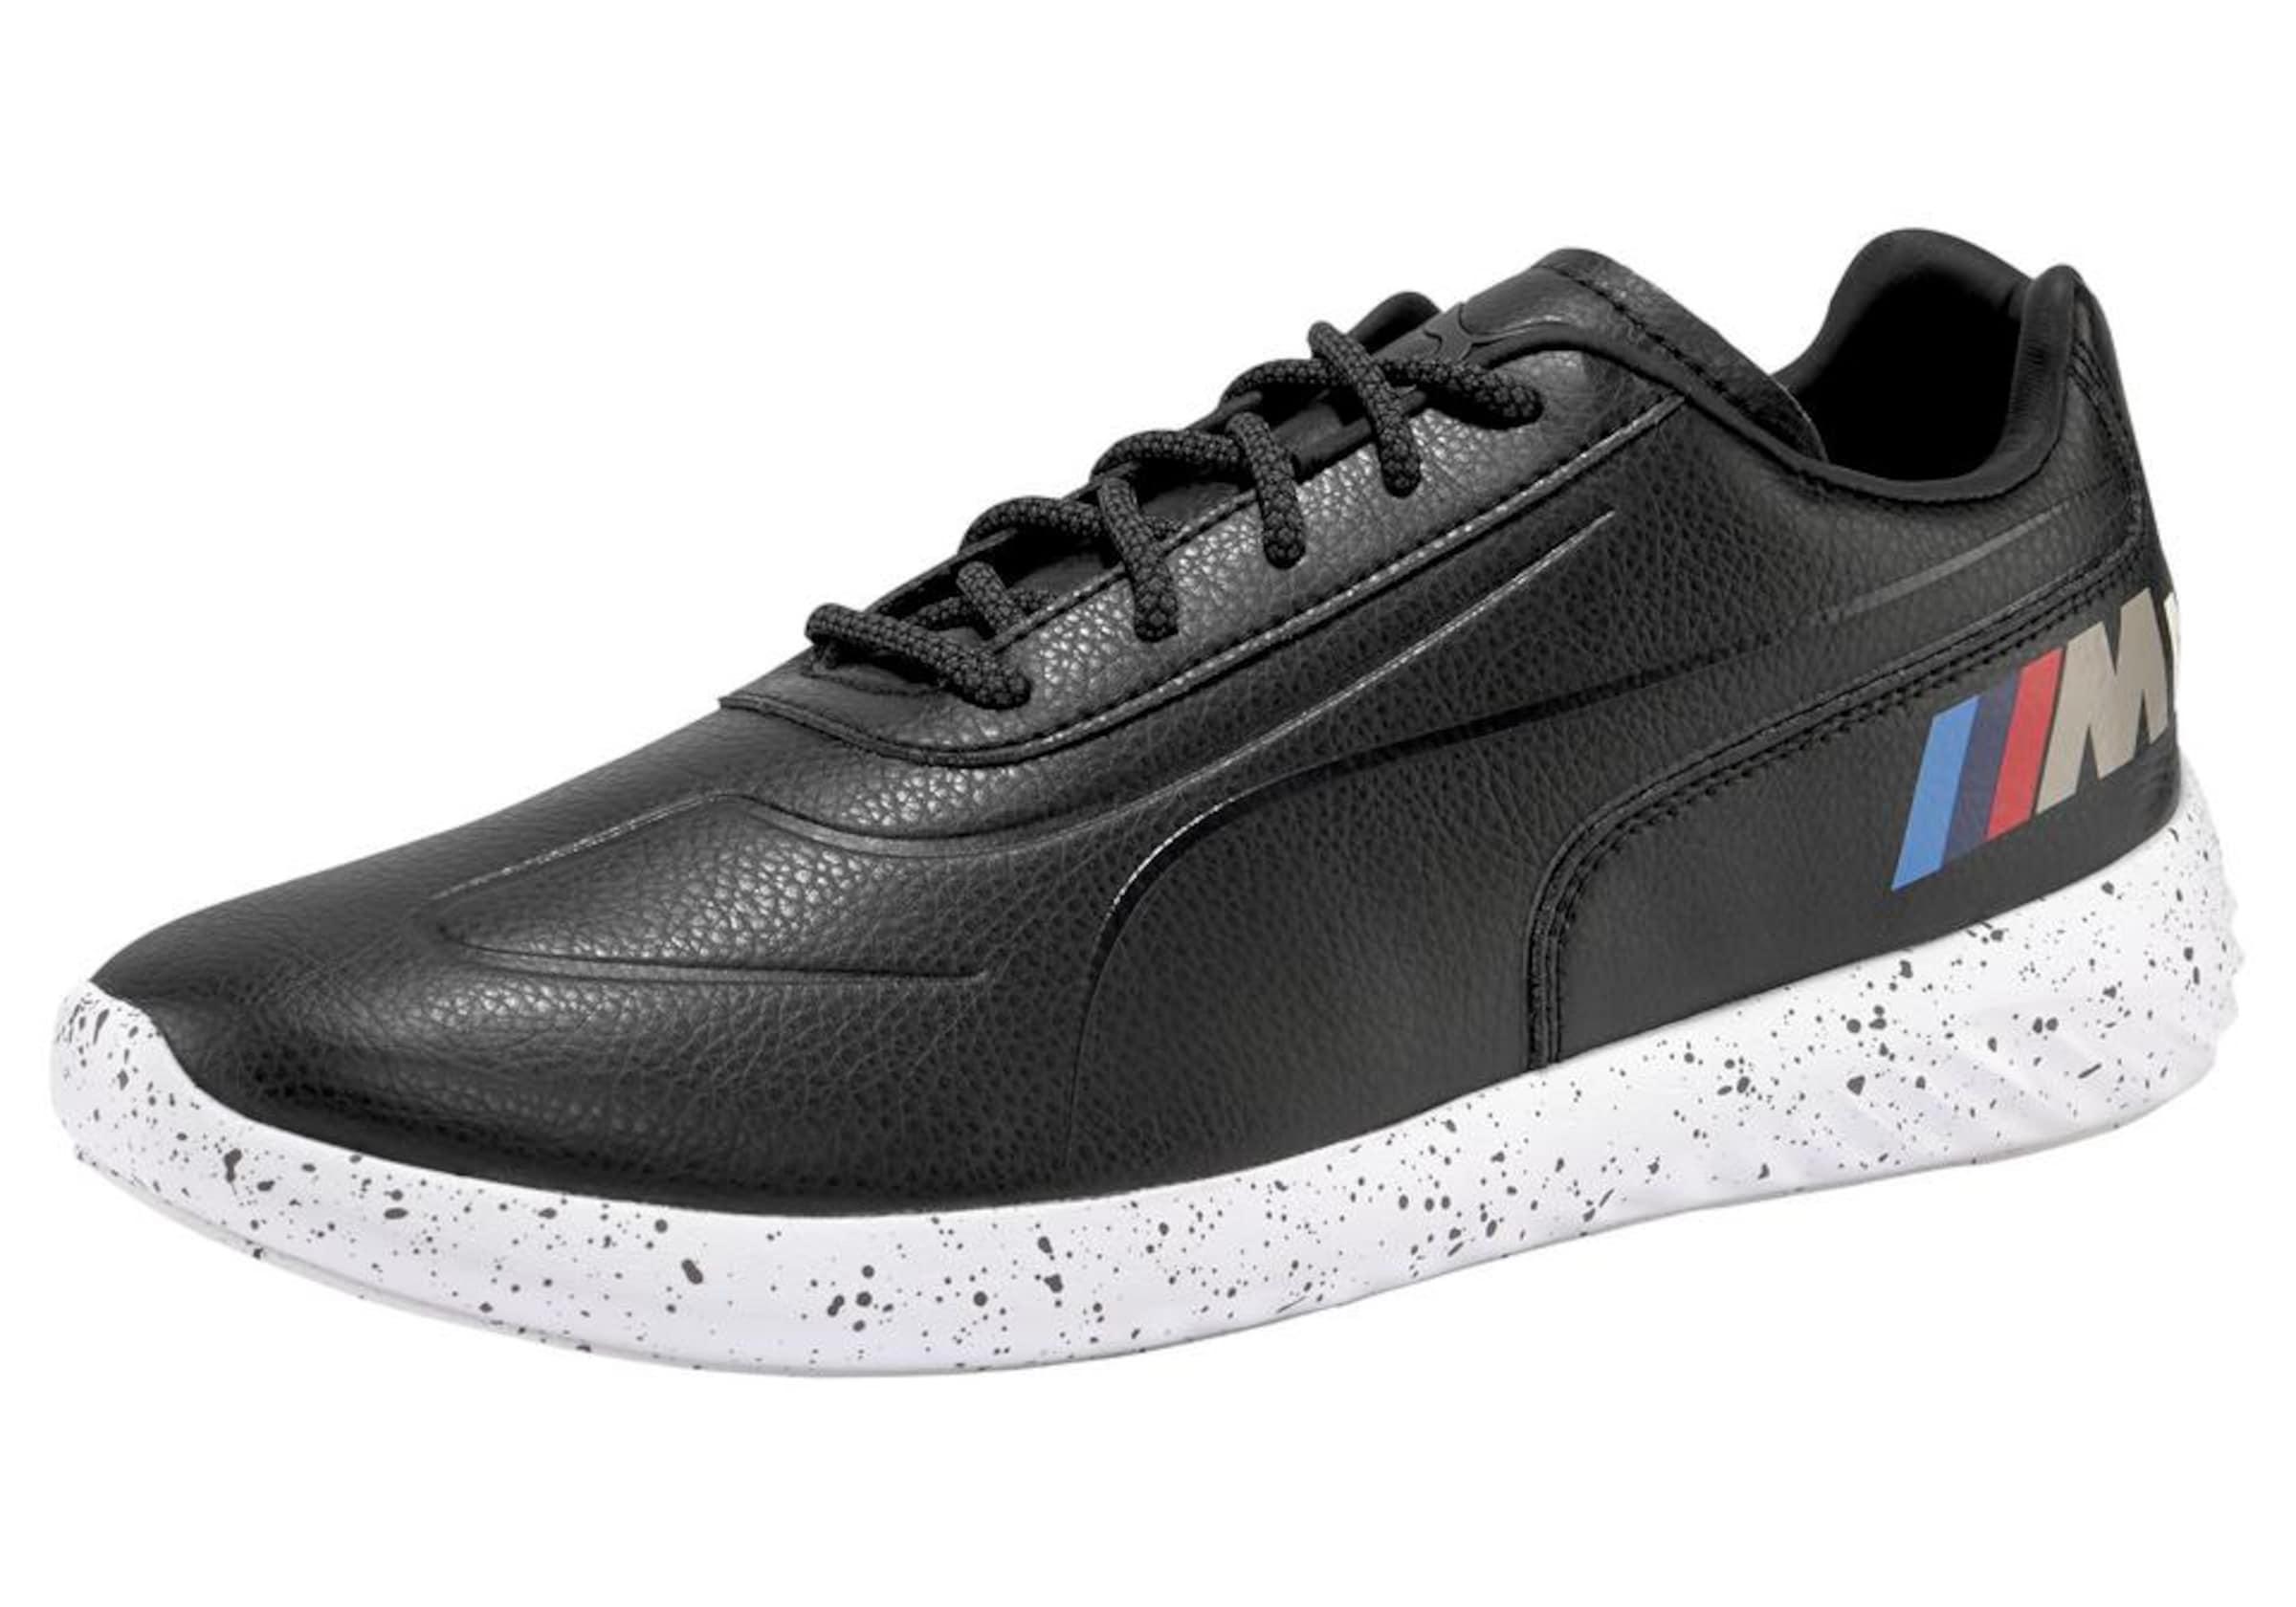 Mms SchwarzWeiß Puma Speed Evo Synth' Cat In Sneaker 'bmw n0w8kXONP